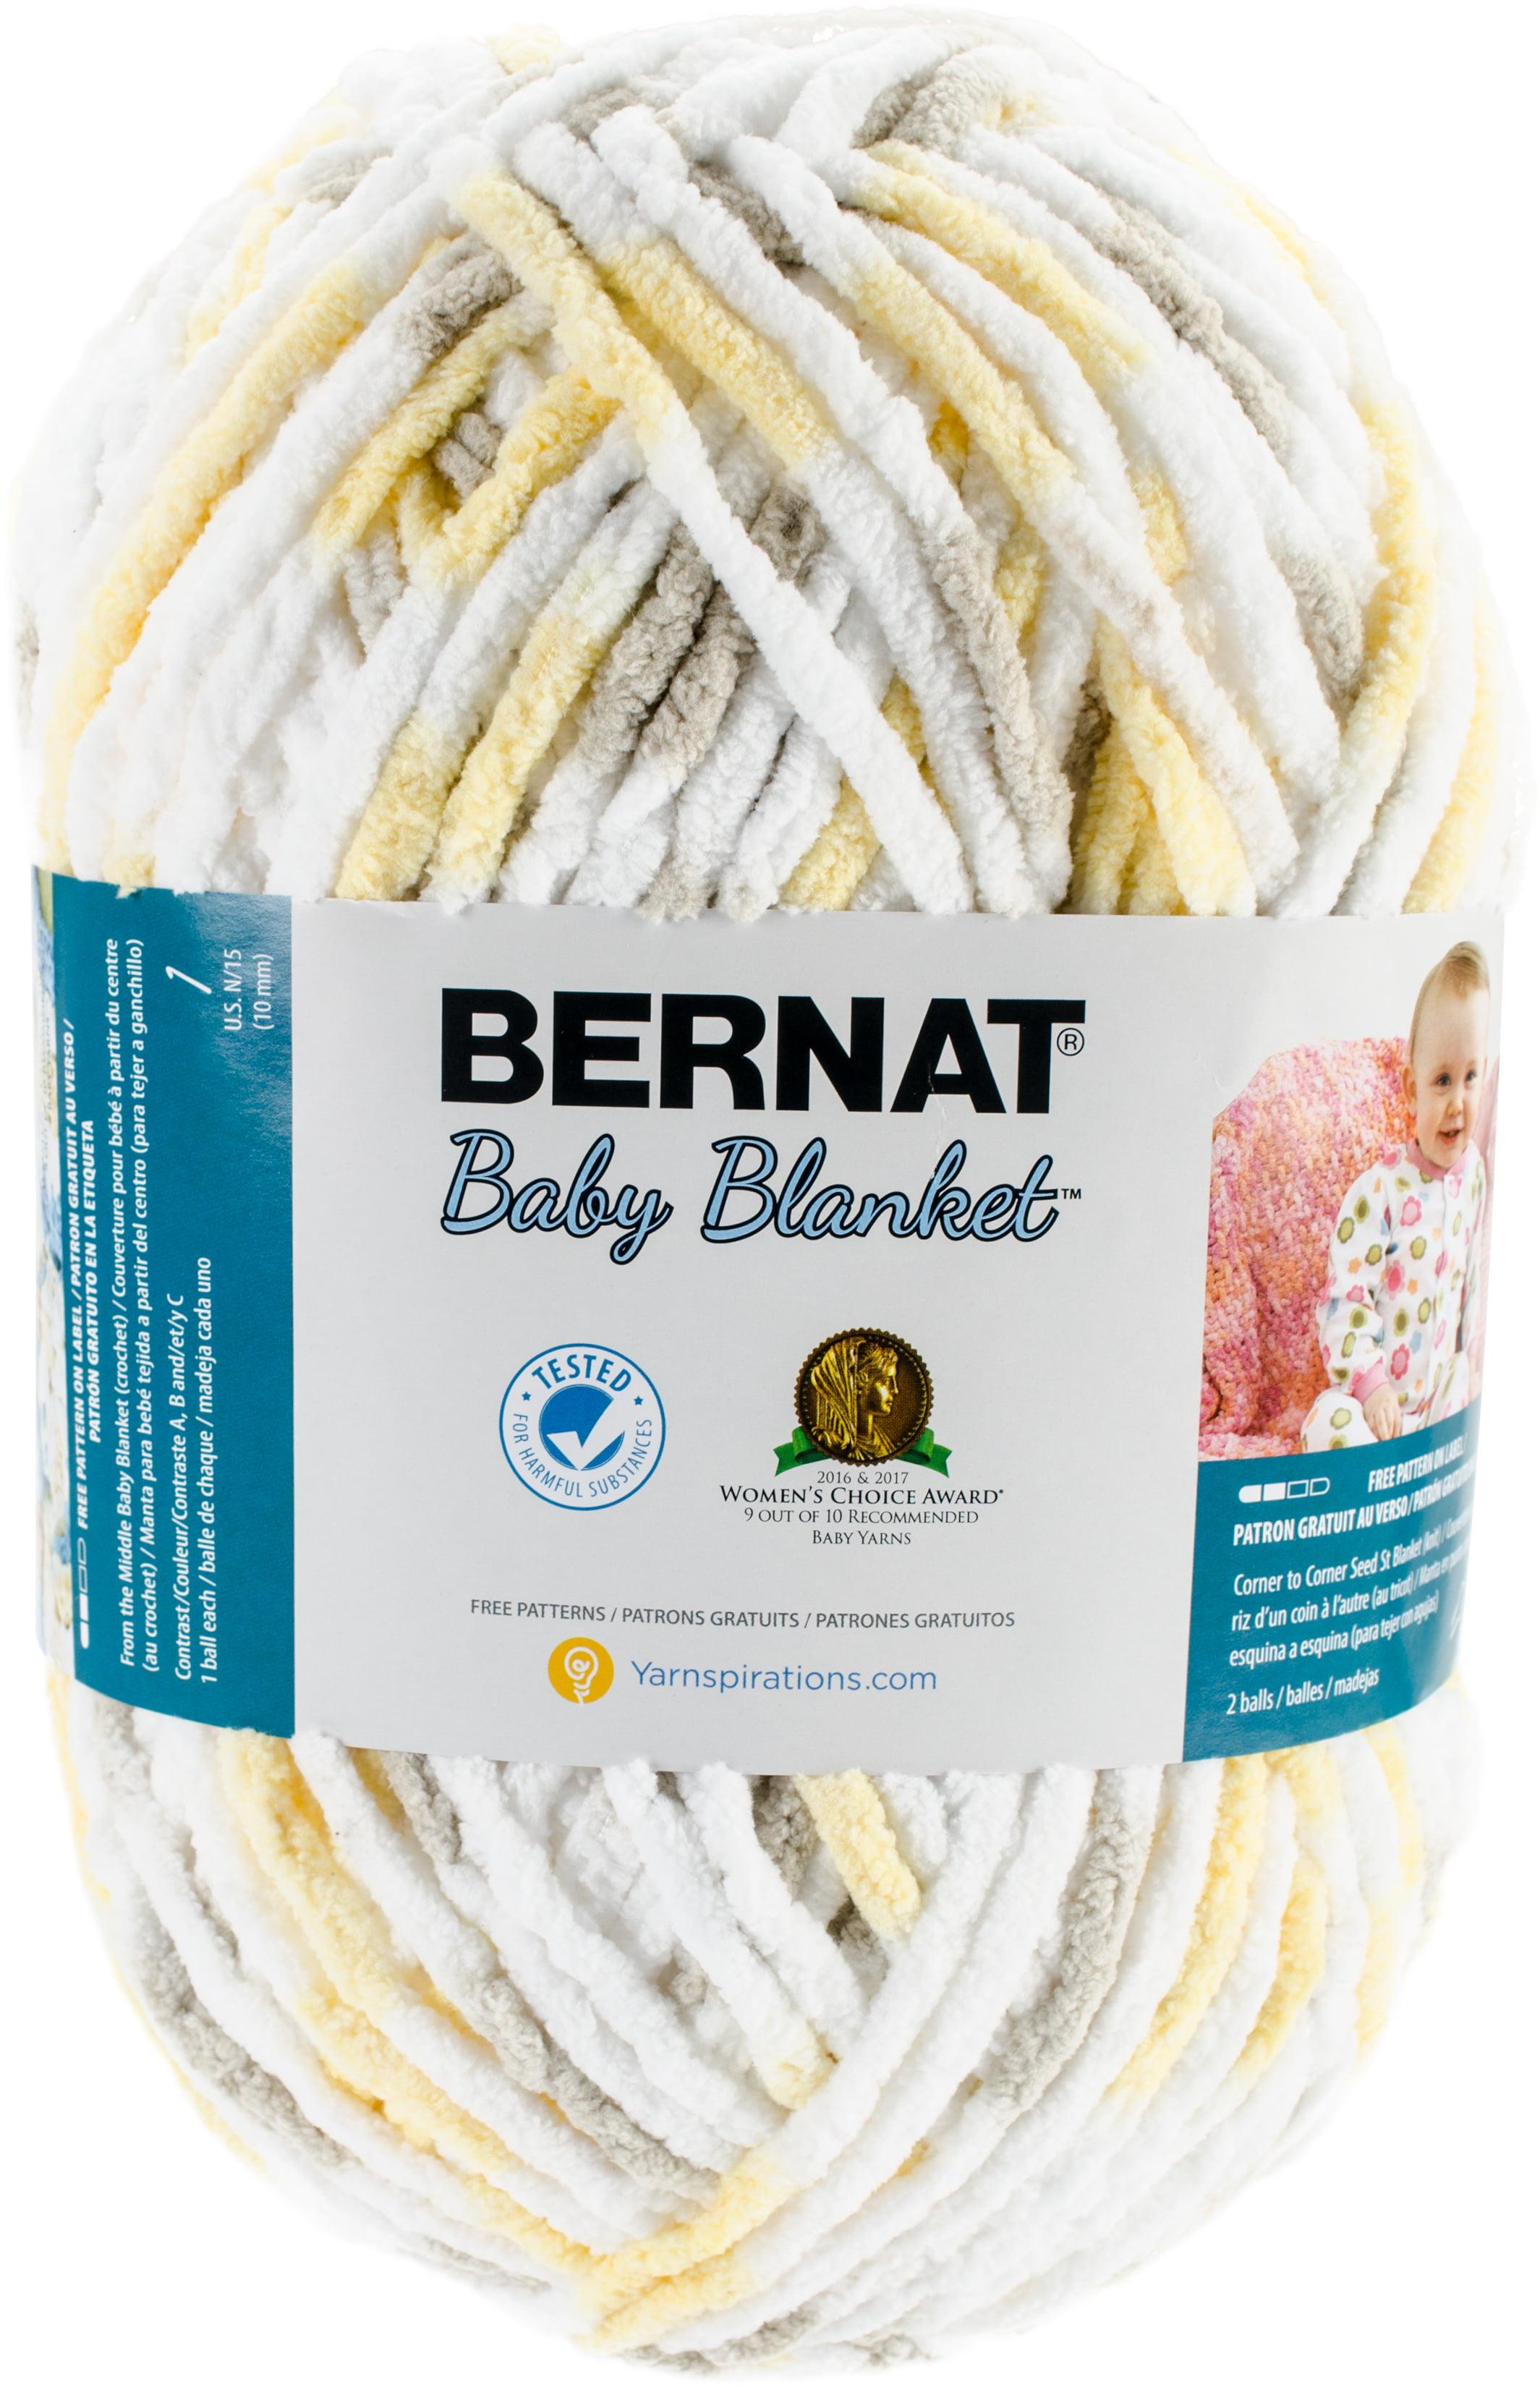 Bernat Baby Blanket Big Ball YarnChicks & Bunnies - Walmart.com